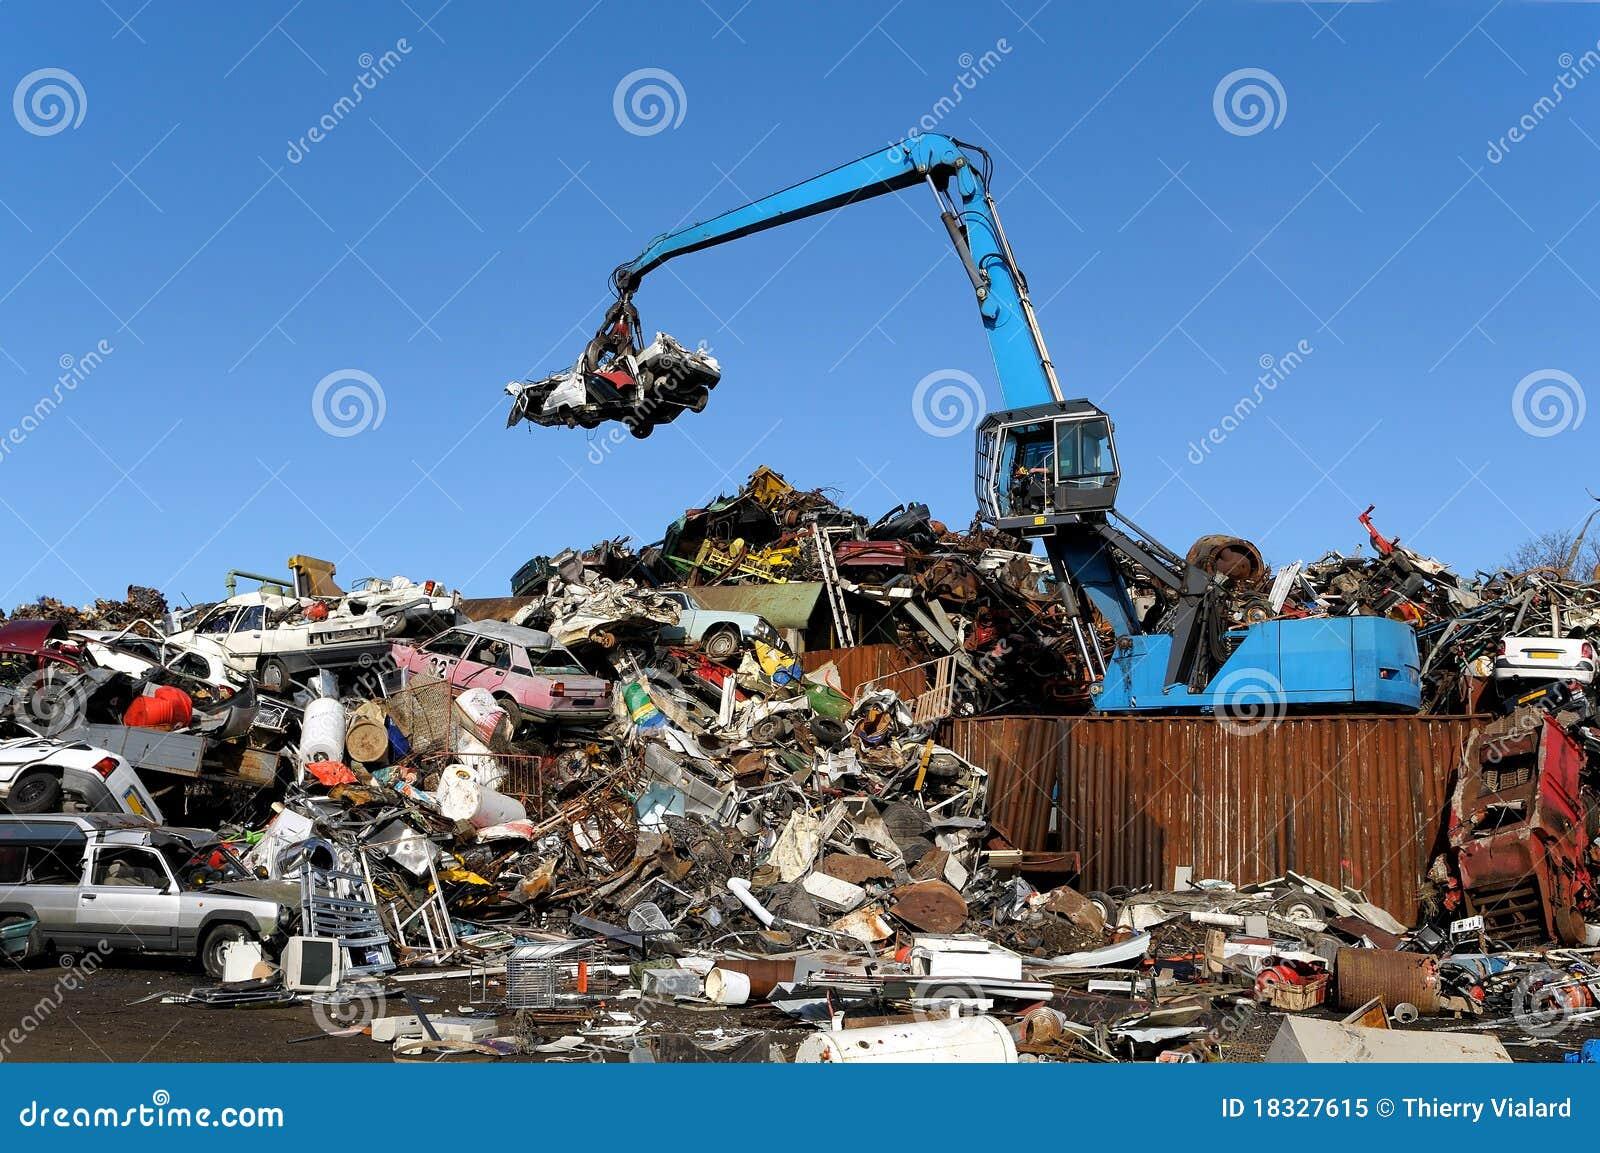 Scrapyard scenery - special car is dividing metal rubbish.